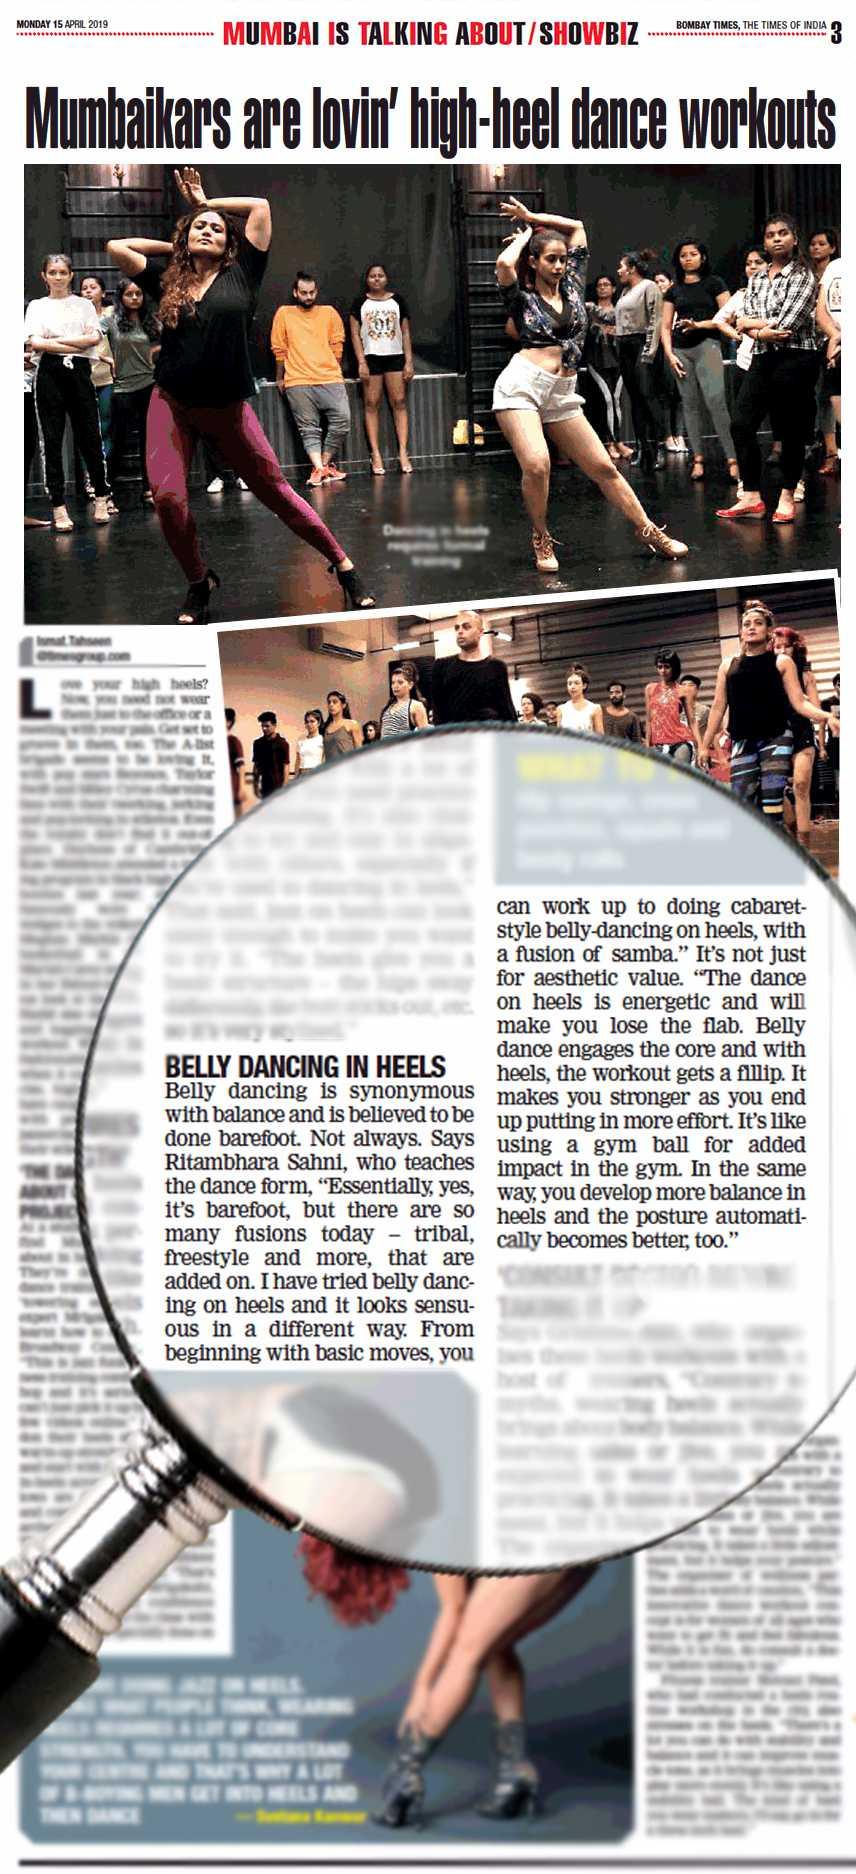 Bombay Times | BELLY DANCE CLASSES IN MUMBAI | BELLY DANCE INSTITUTE MUMBAI BY RITAMBHARA SAHNI